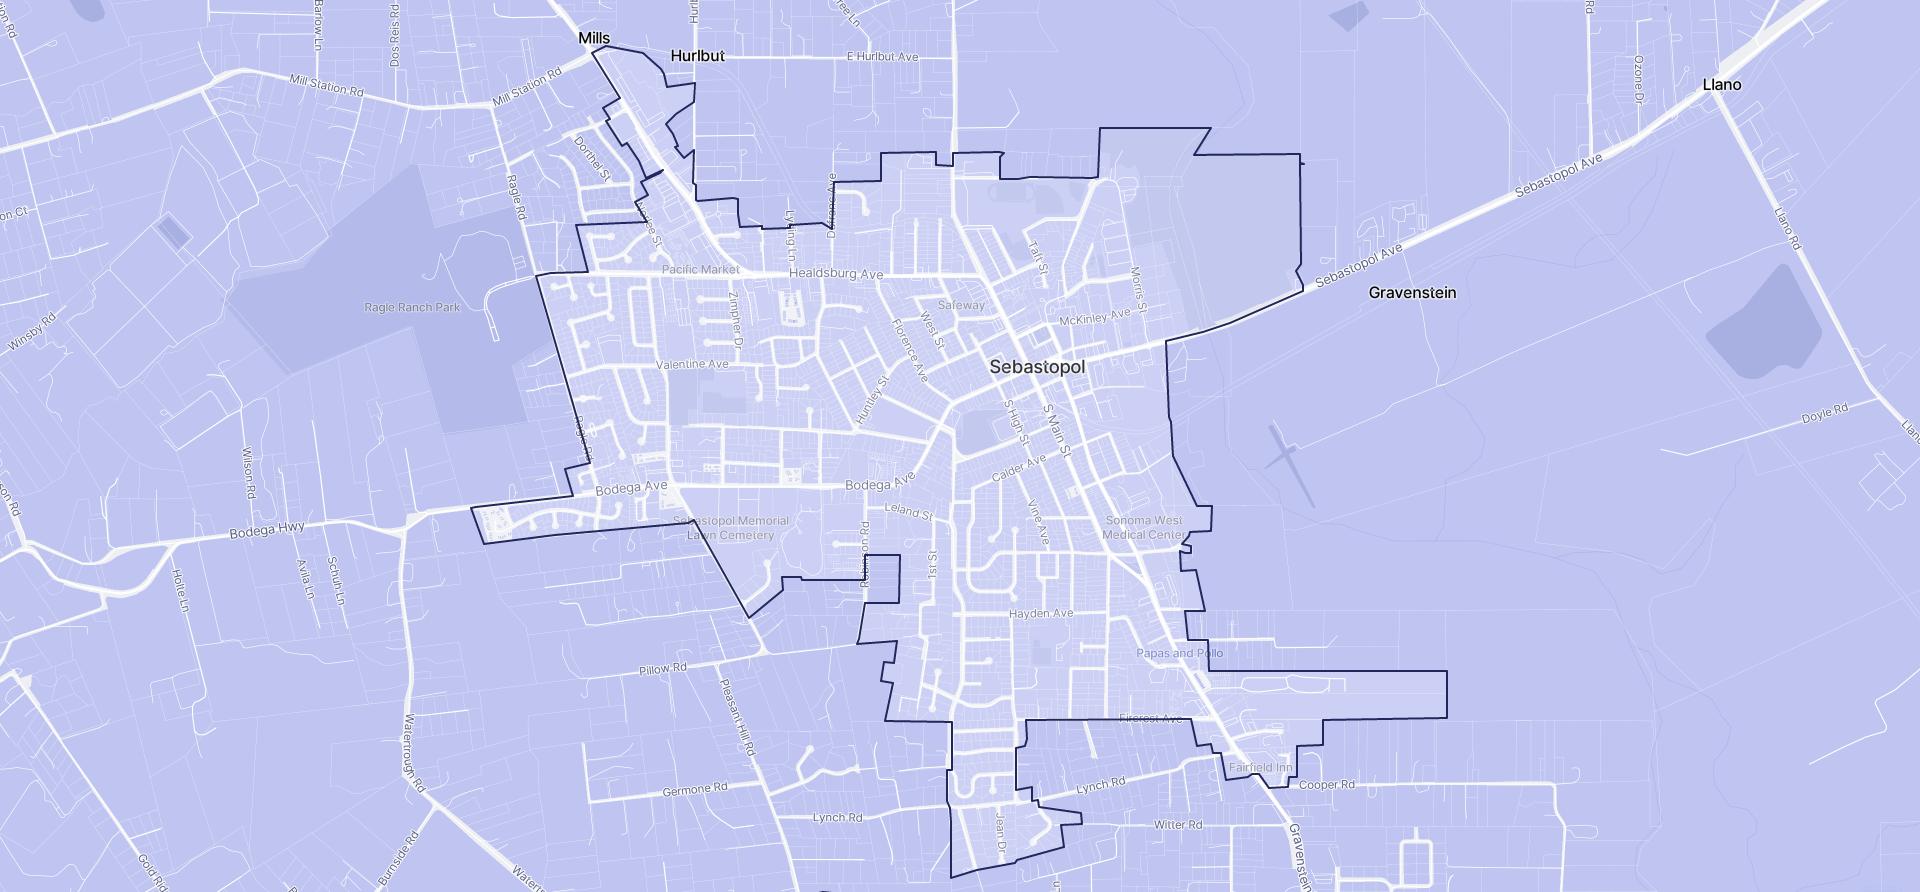 Image of Sebastopol boundaries on a map.